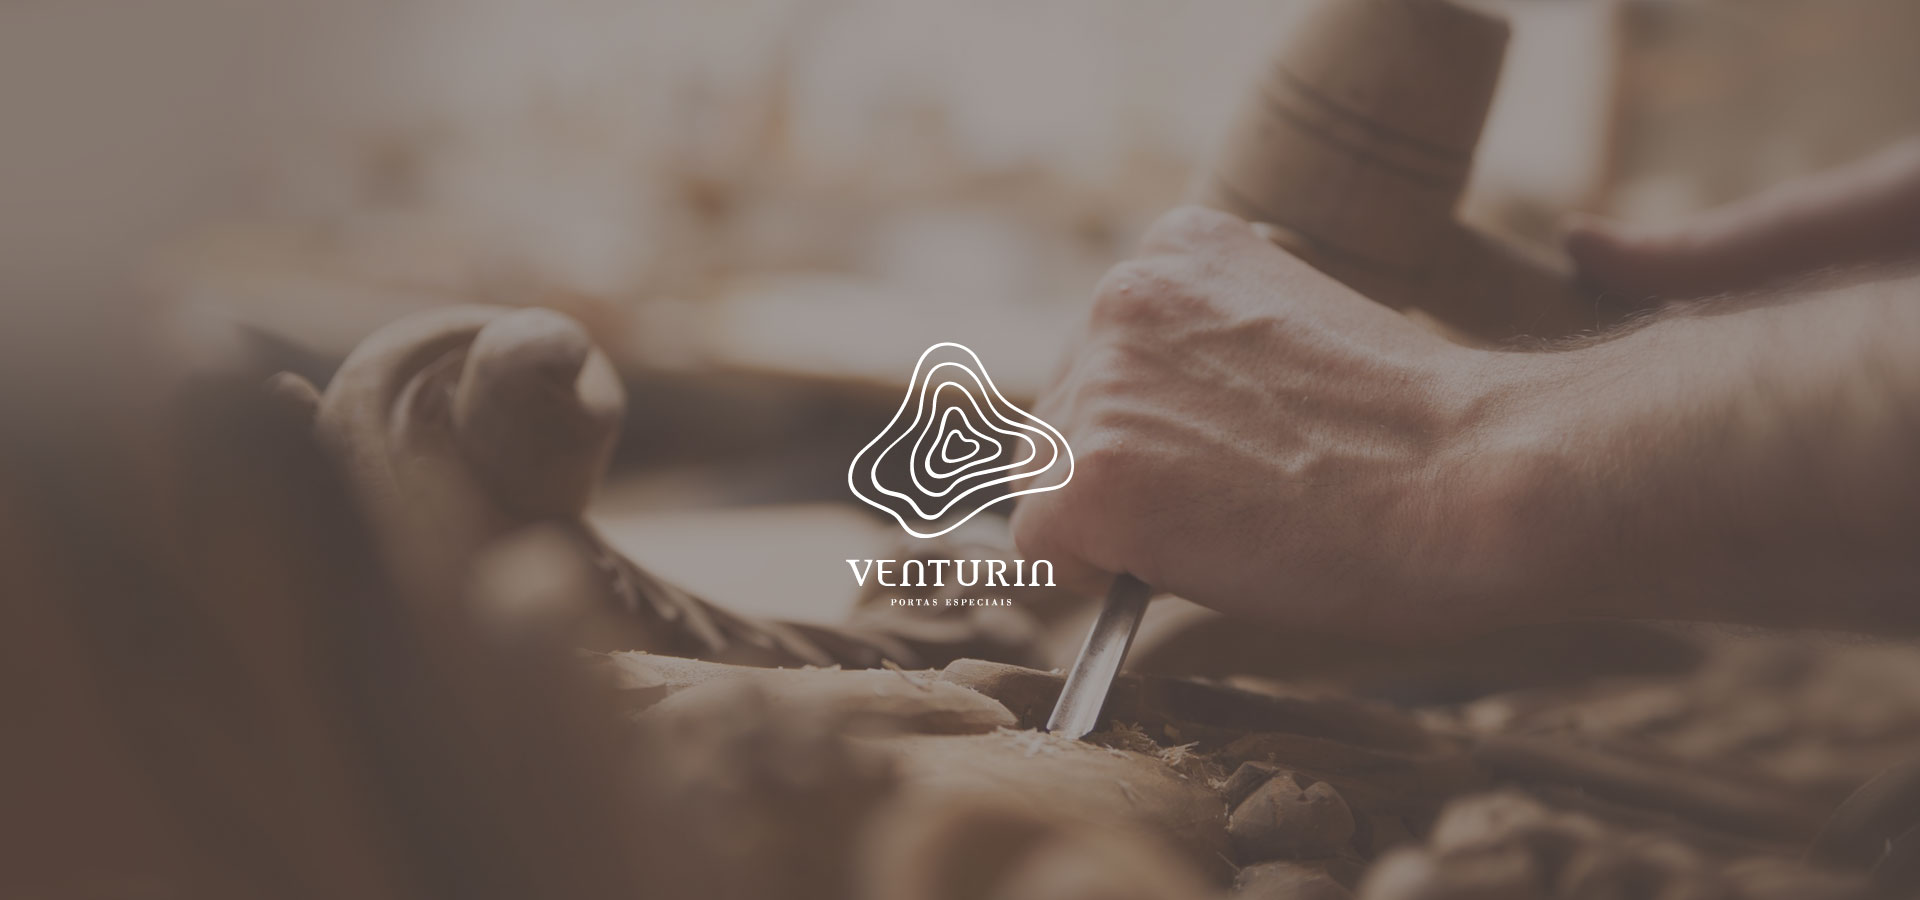 [XOK Branding] Venturin